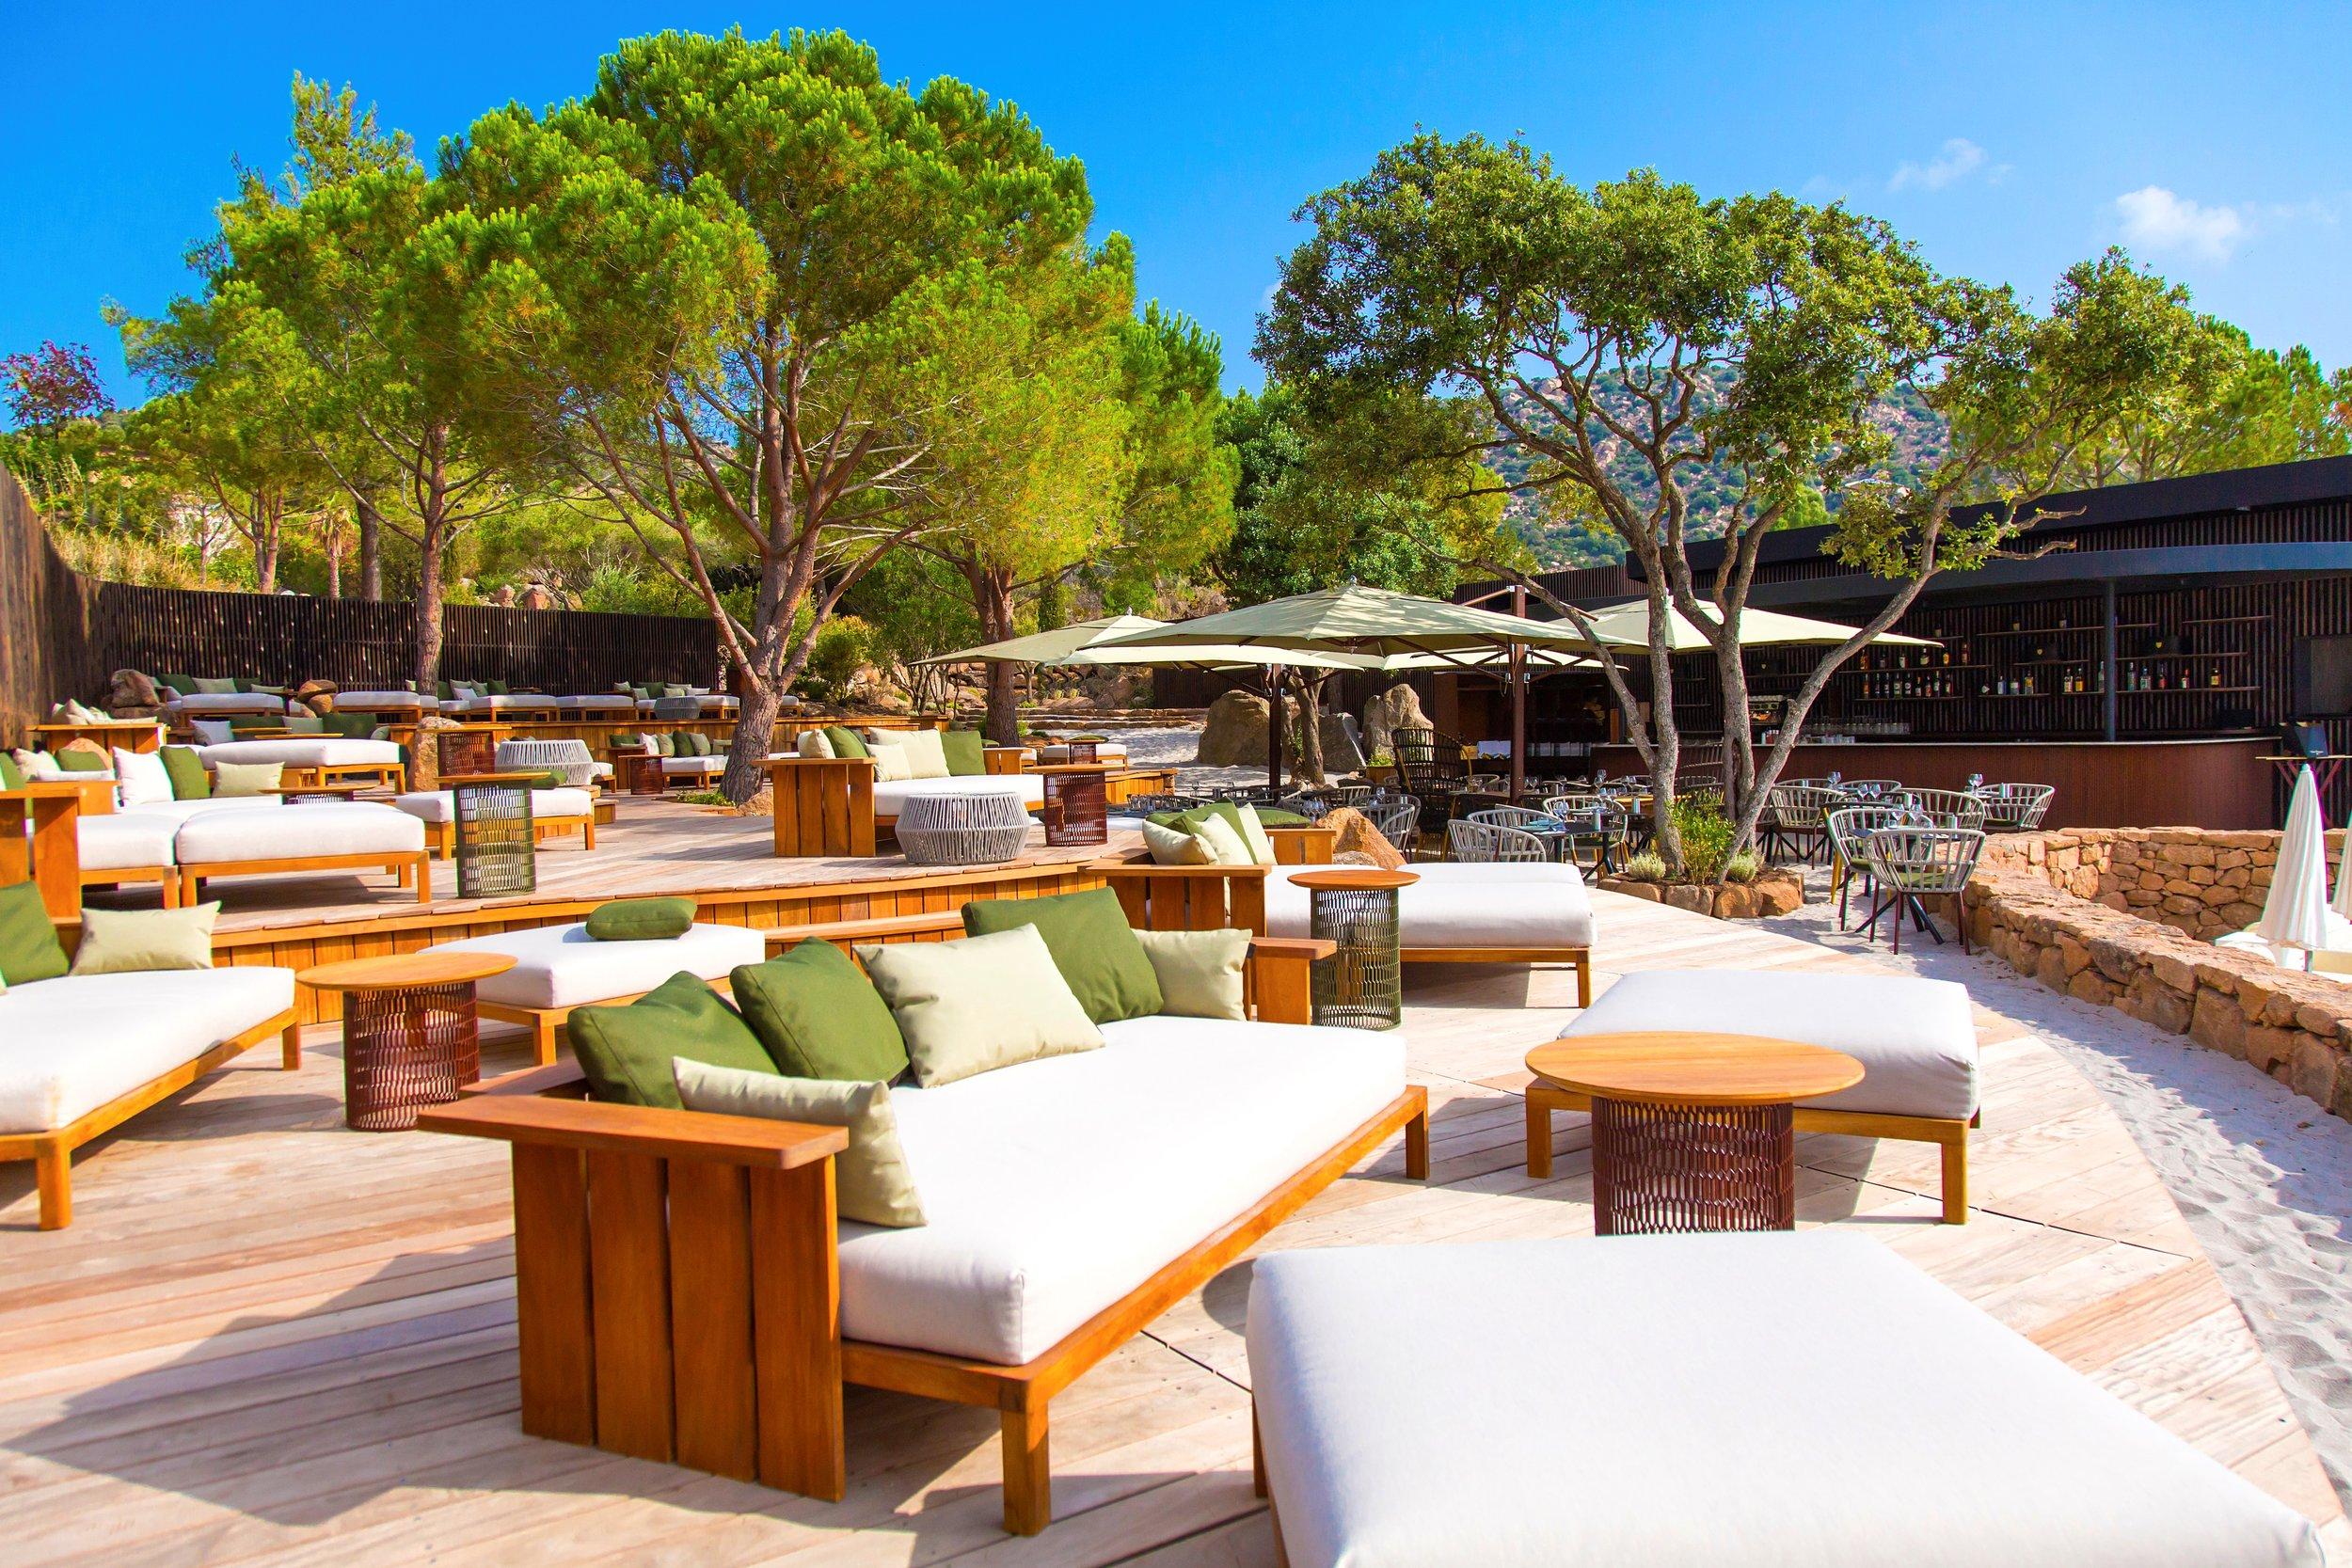 Espace Lounge Sea Lounge Porto Vecchio.jpg